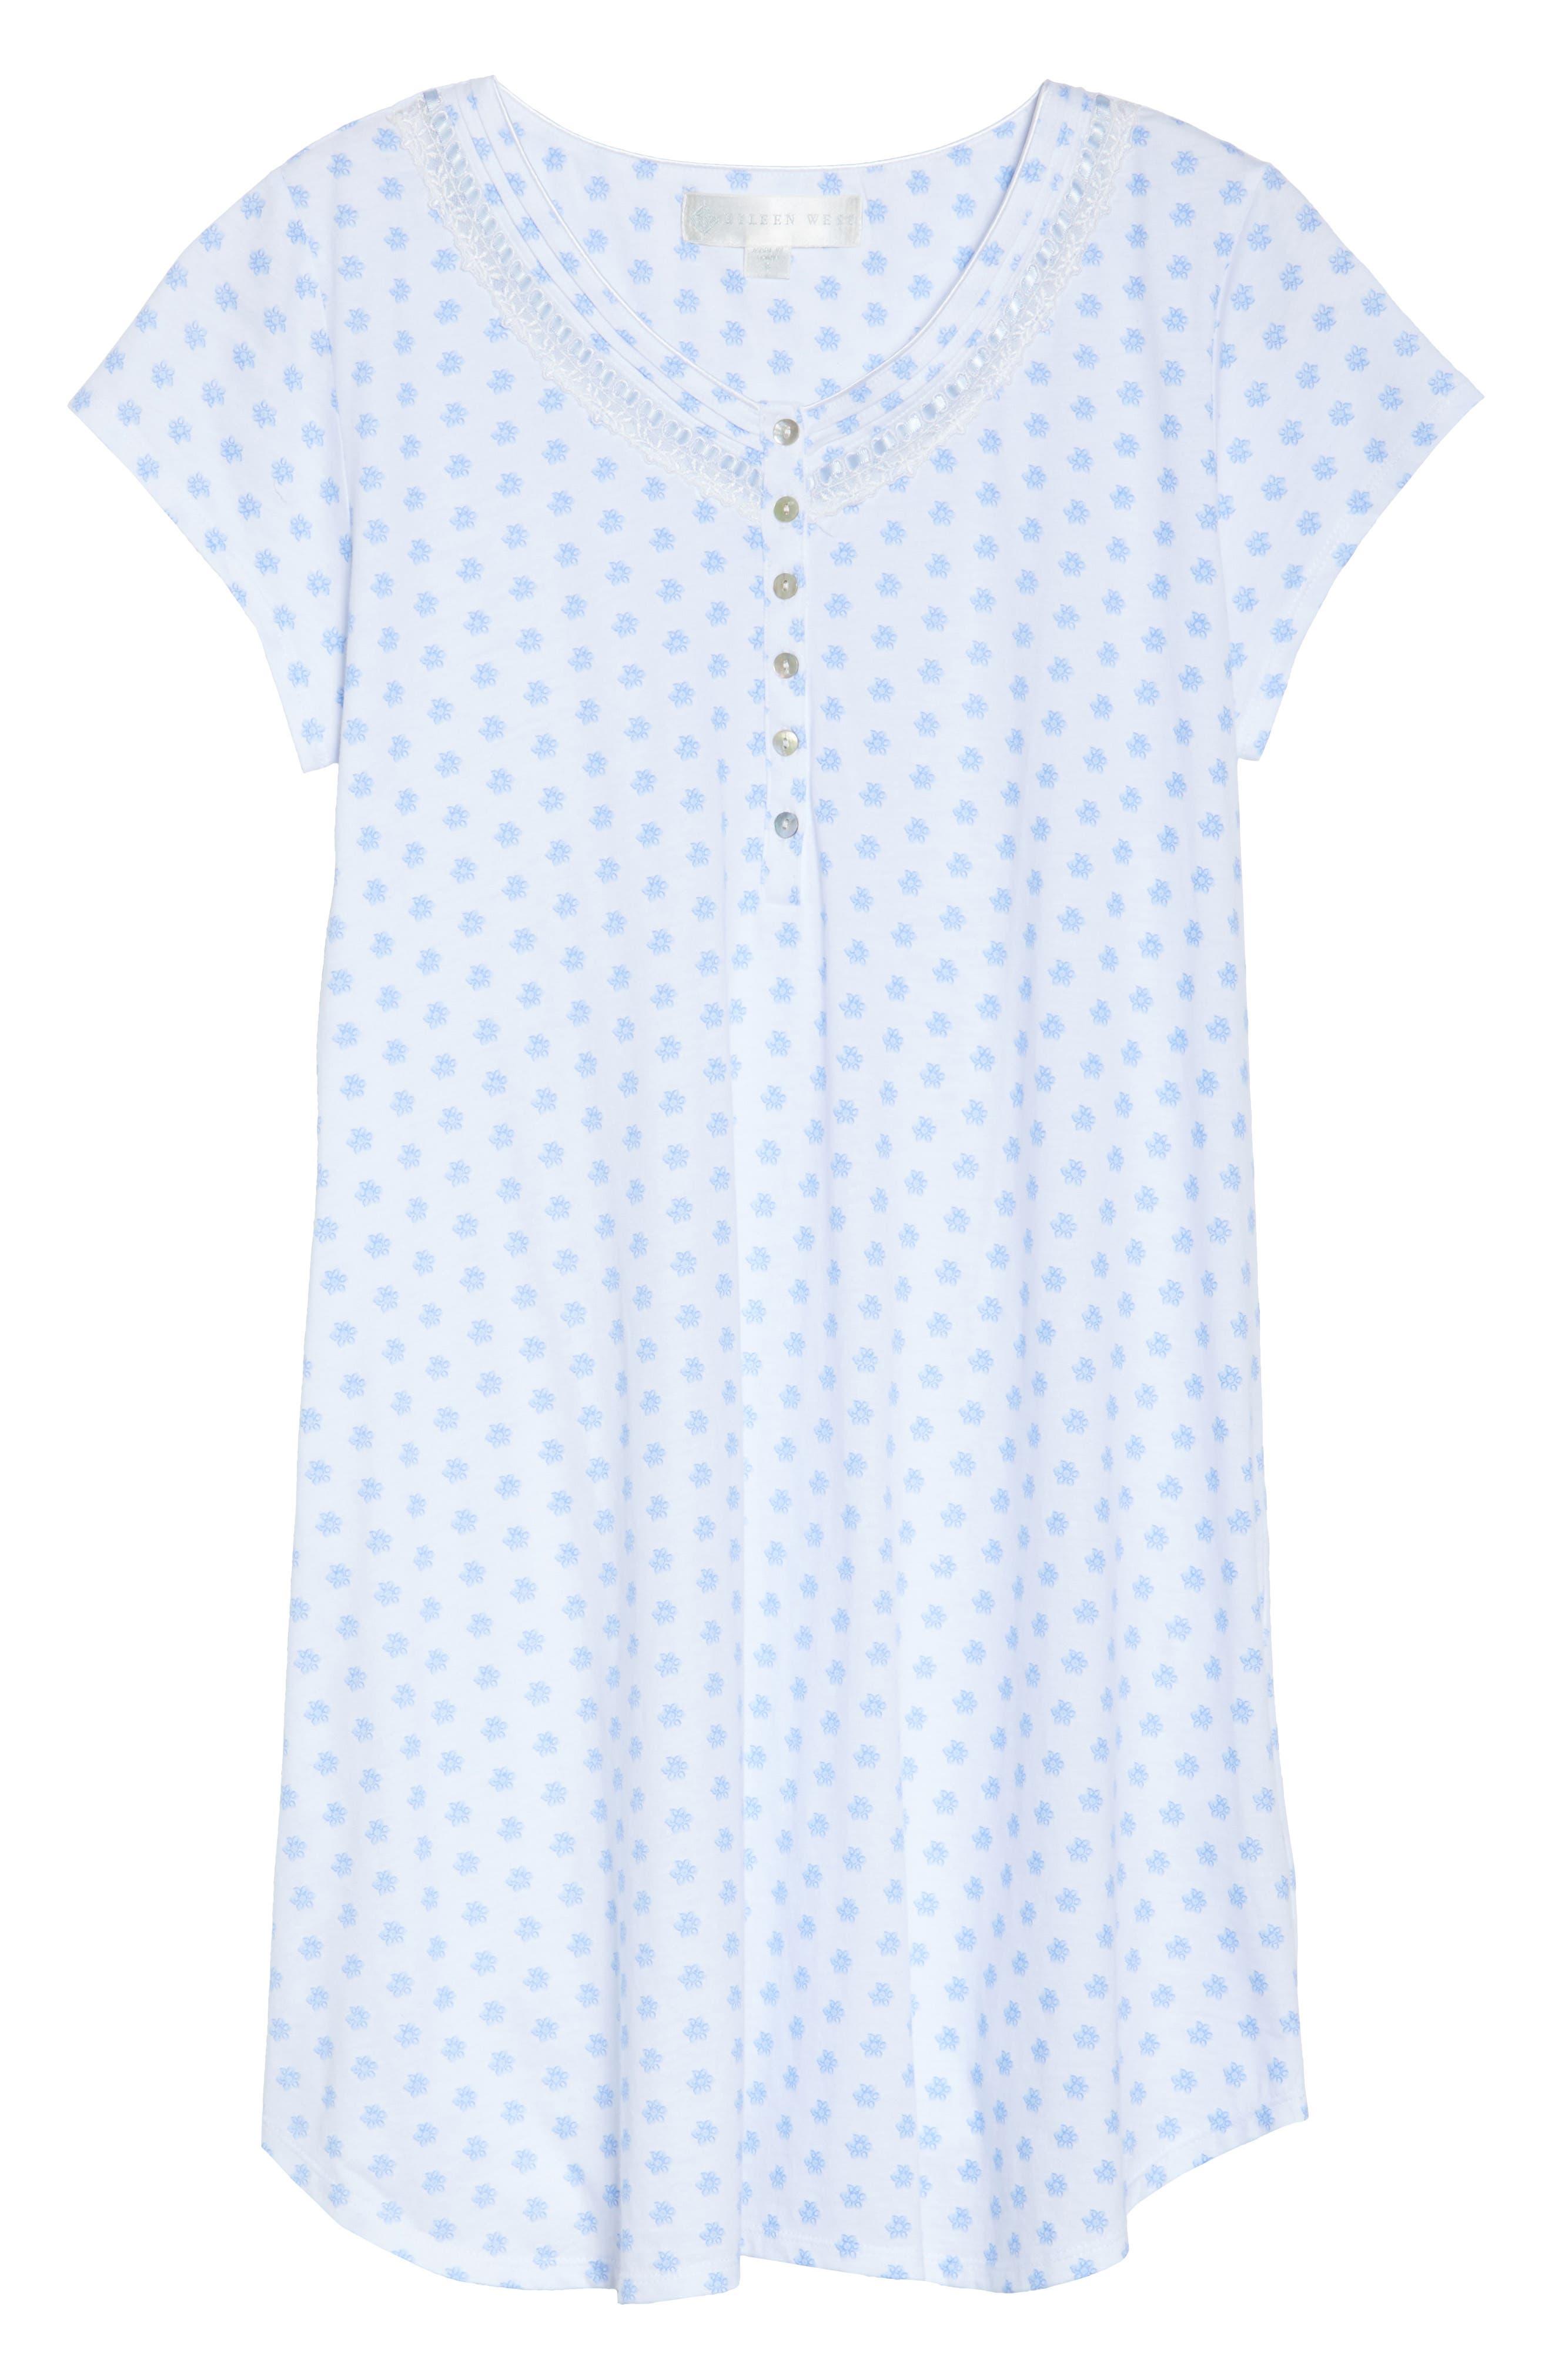 Jersey Sleep Shirt,                             Alternate thumbnail 6, color,